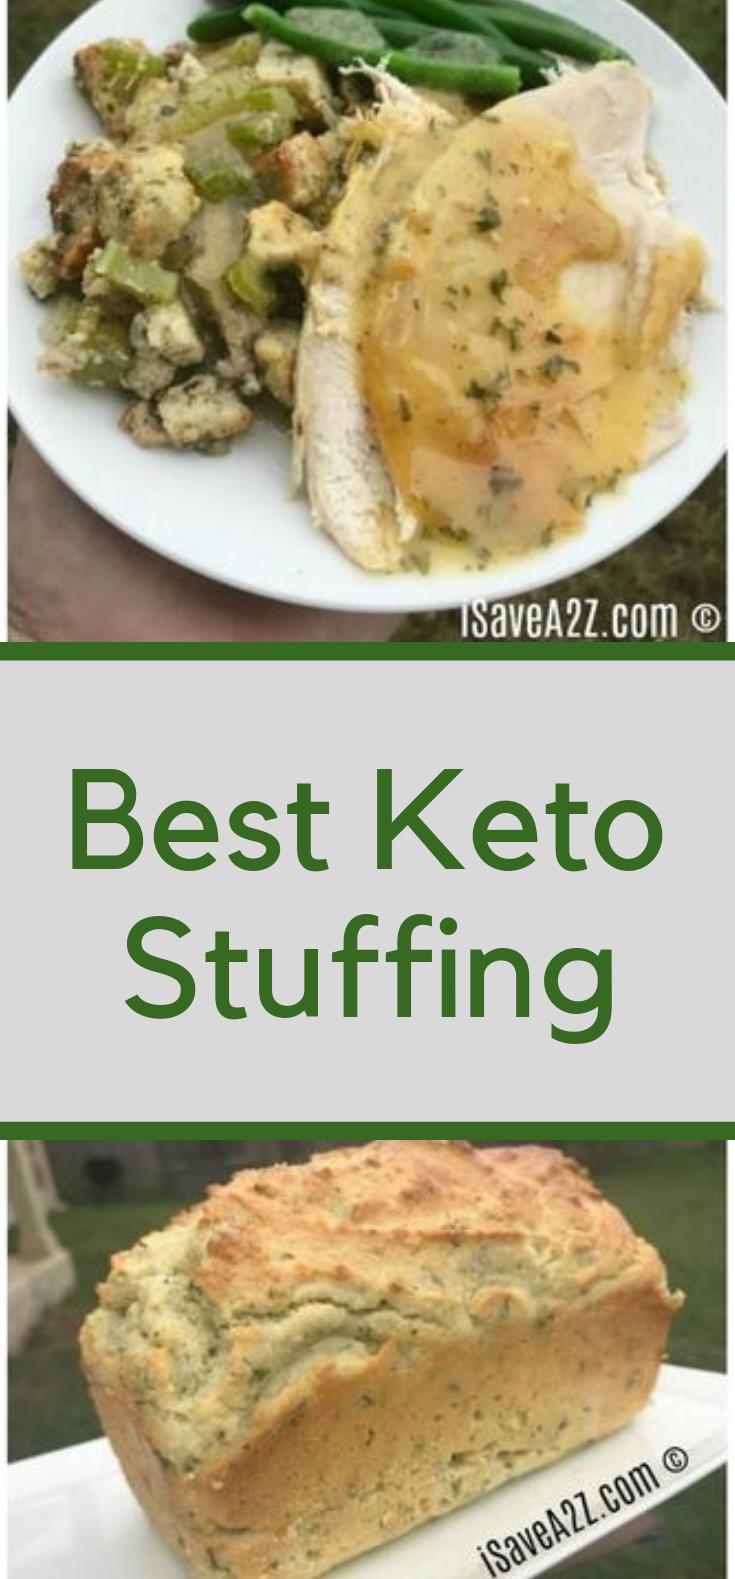 Best Keto Stuffing #dietfood #eadhealthy